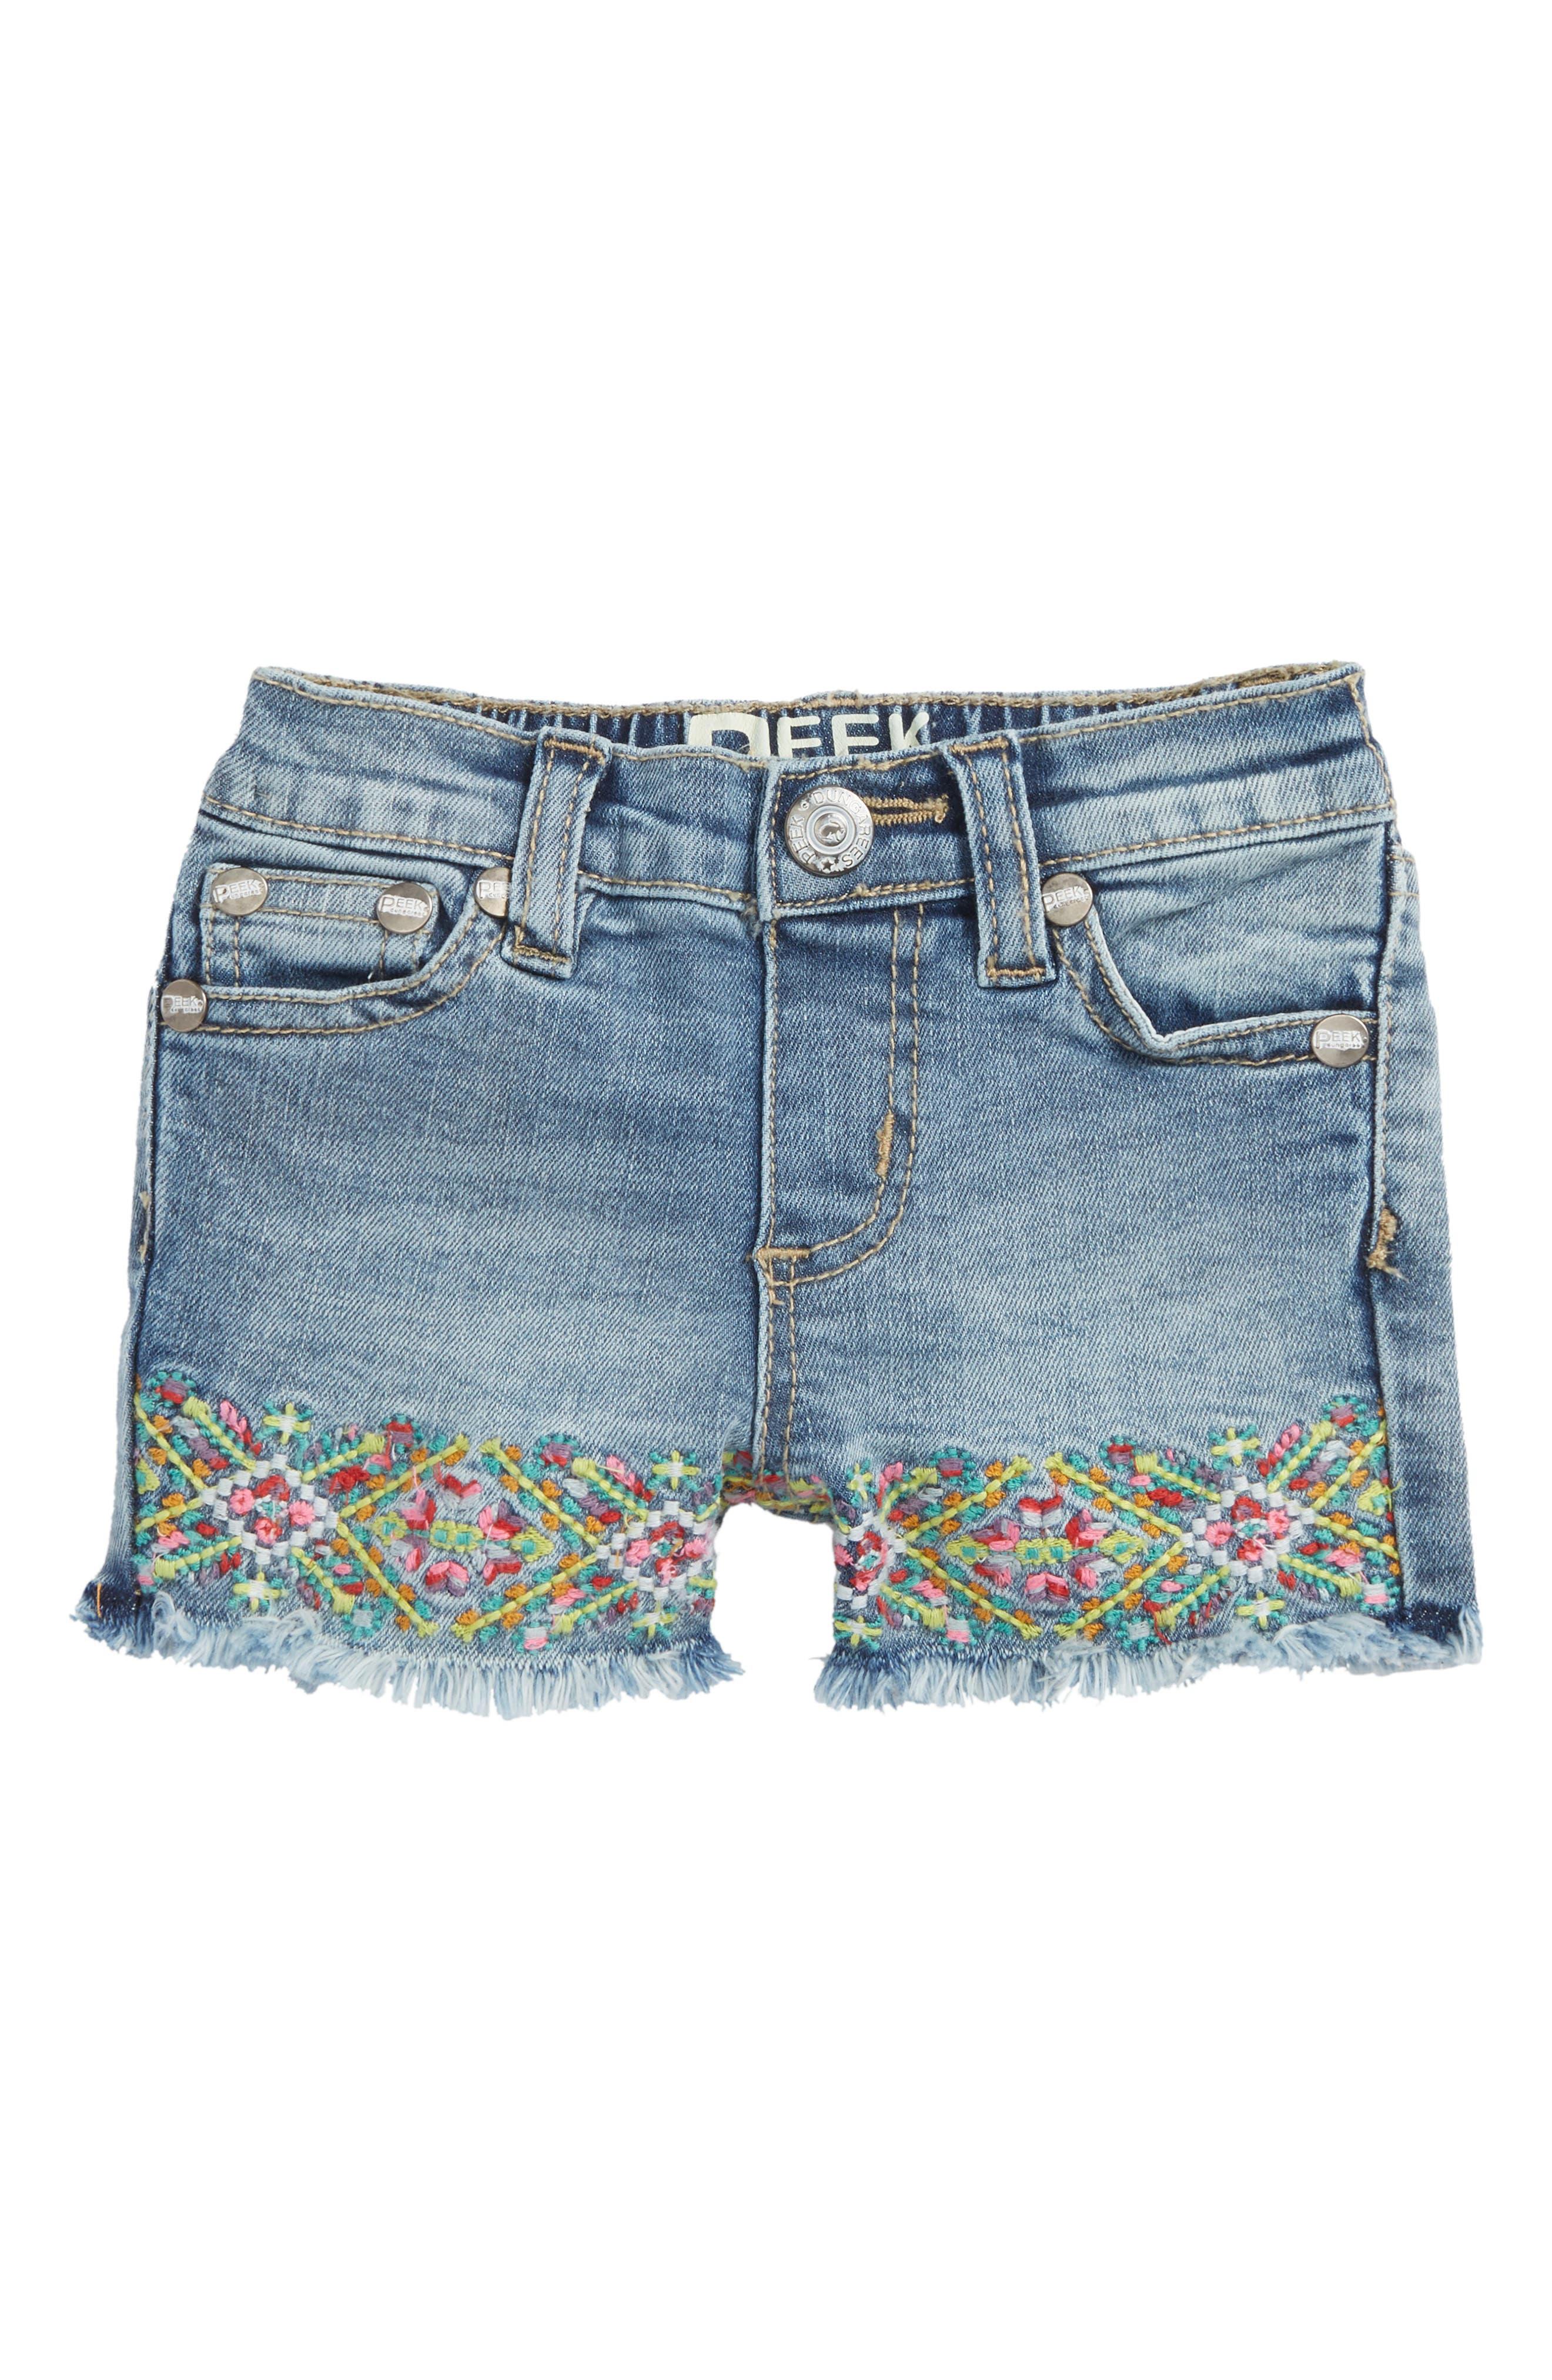 Peek Embroidered Frayed Hem Denim Shorts (Baby Girls)